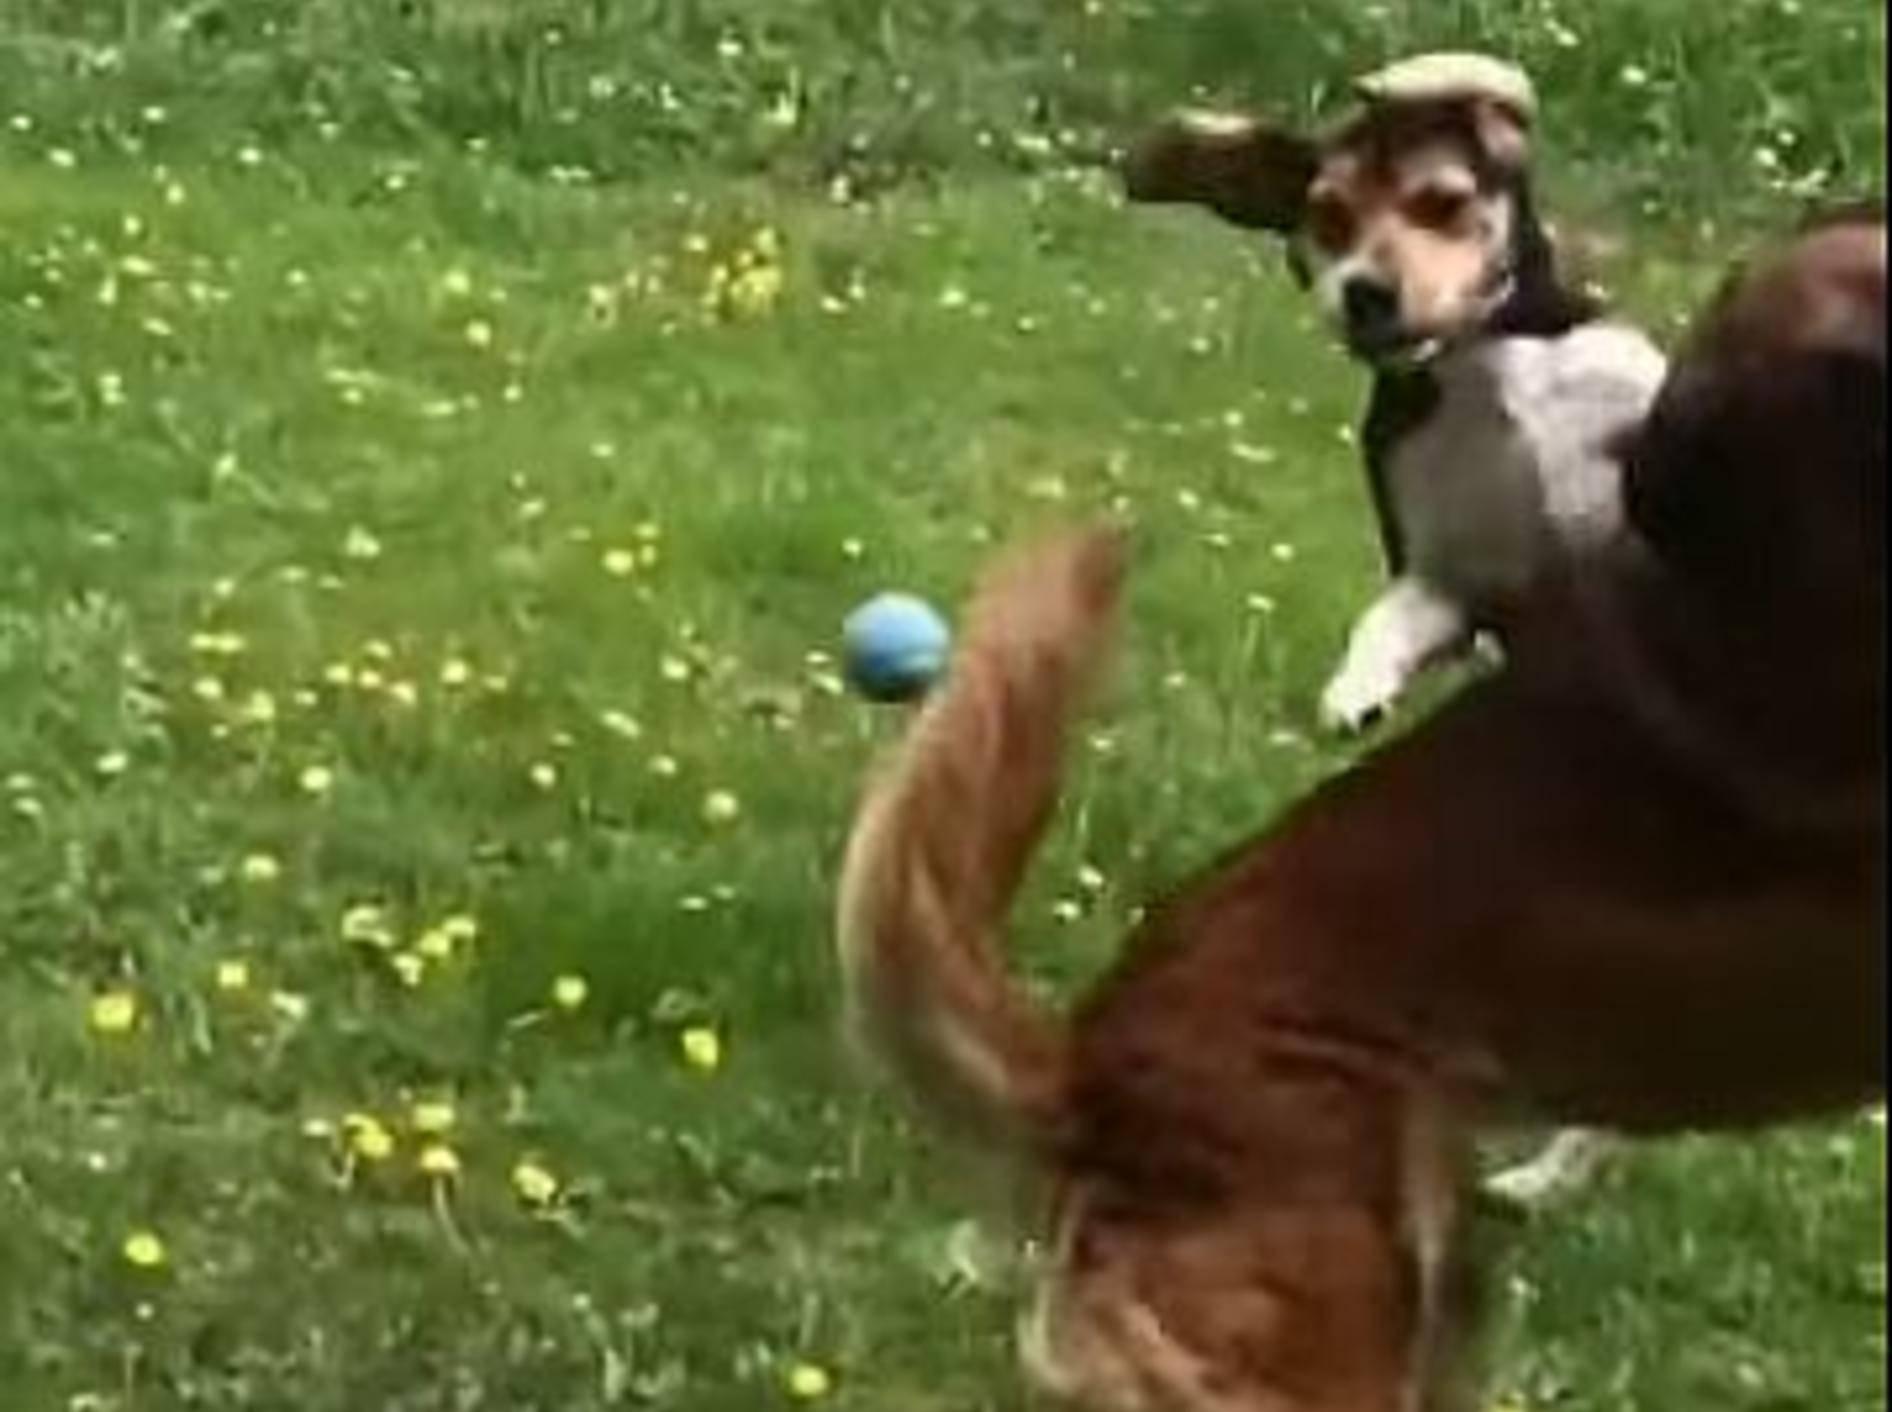 Hundekumpels präsentieren: Ballspielen für Anfänger – Bild: Youtube / unperfect97